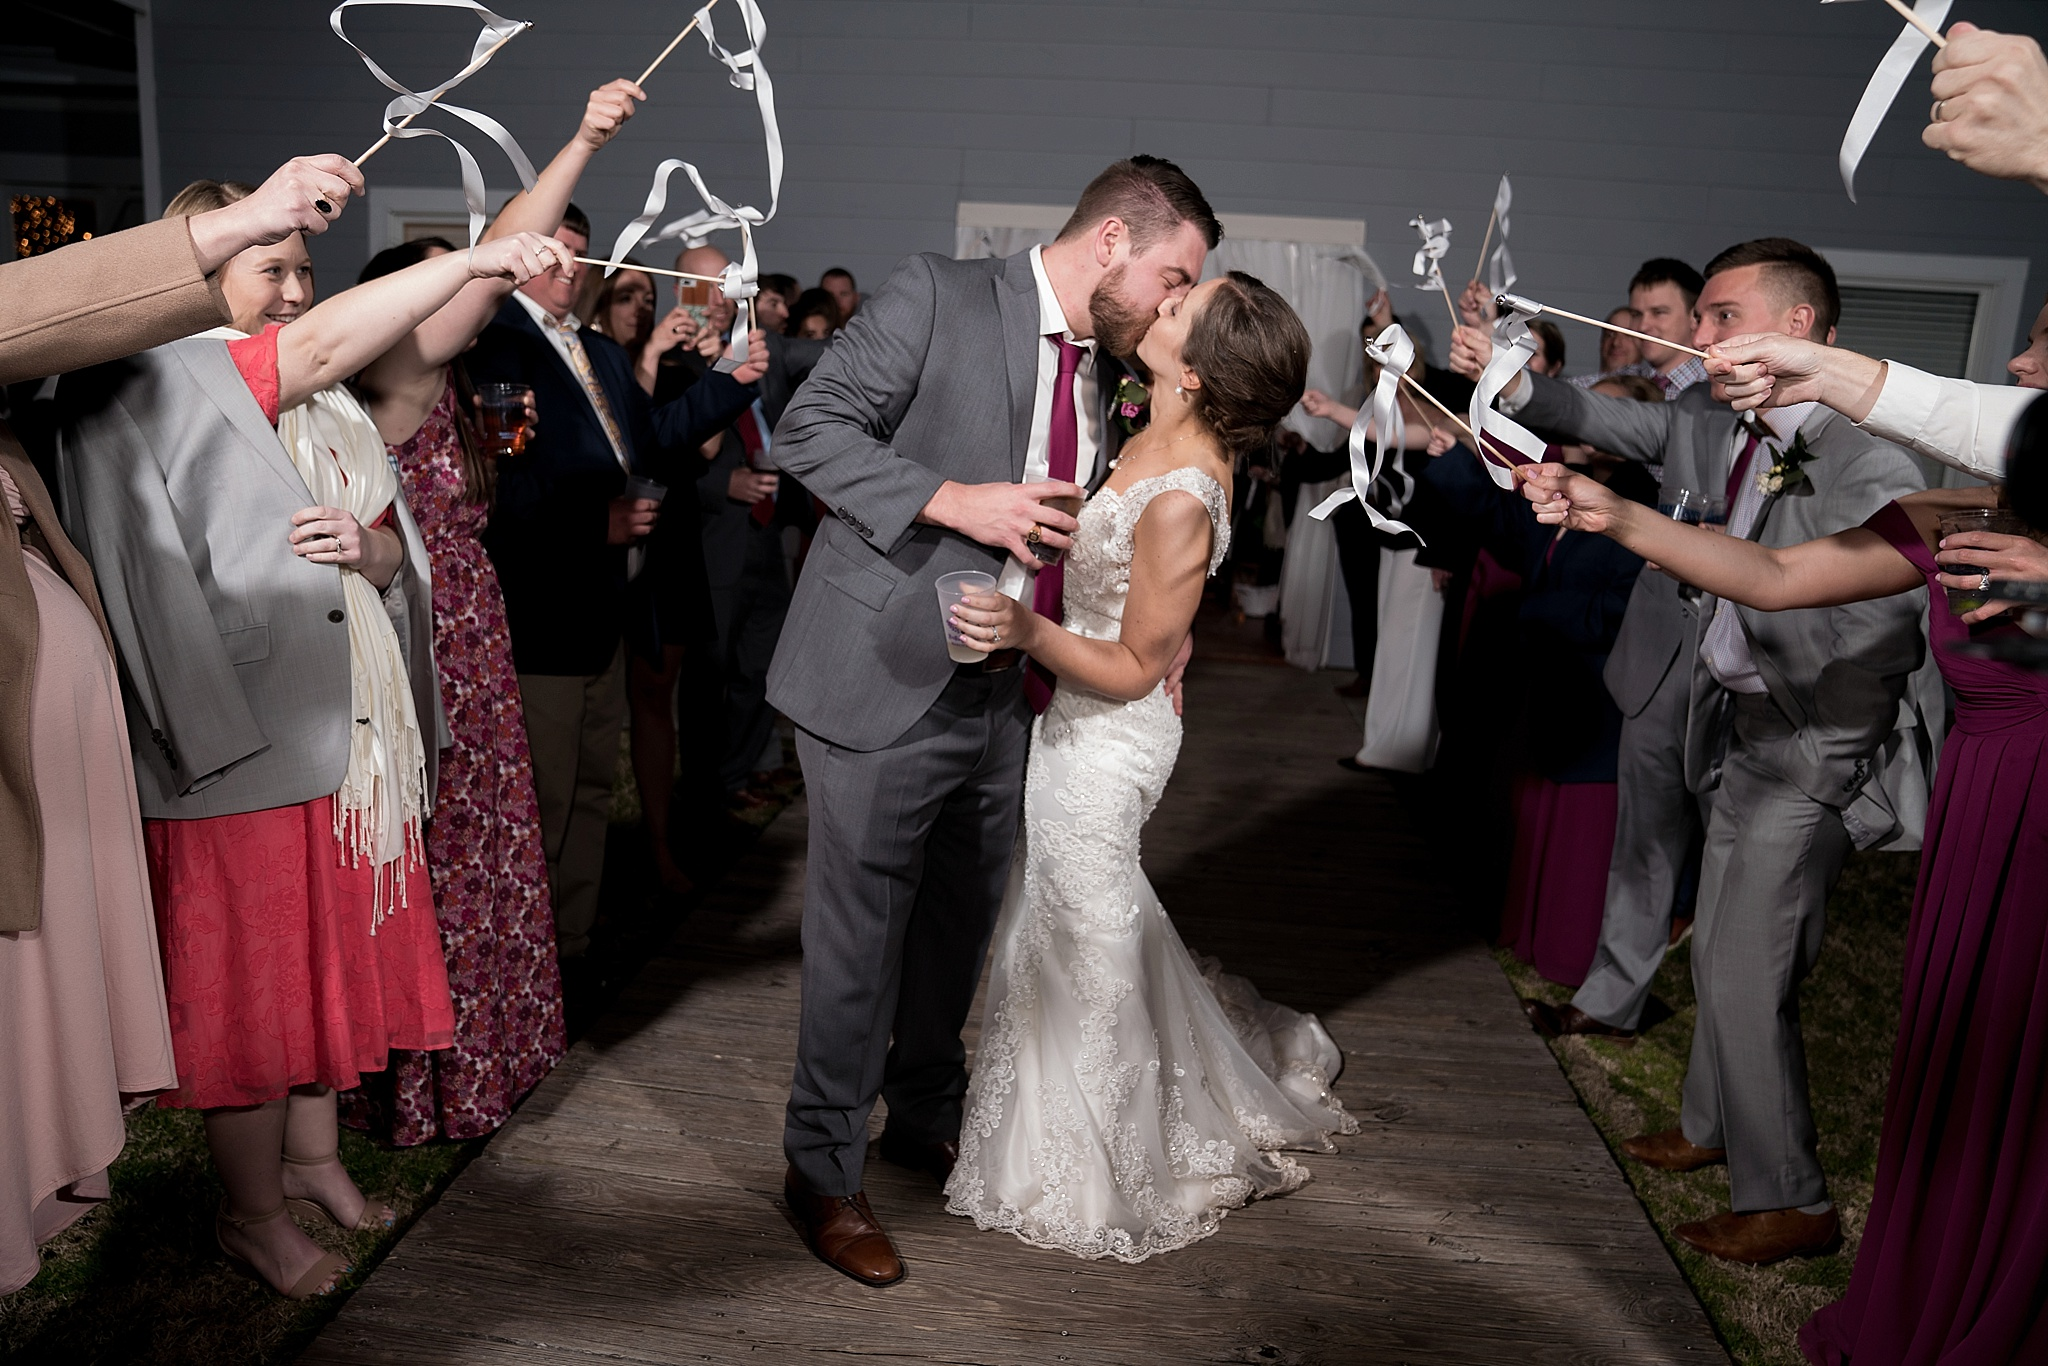 Manteo-NC-Wedding-Photographer-156.jpg